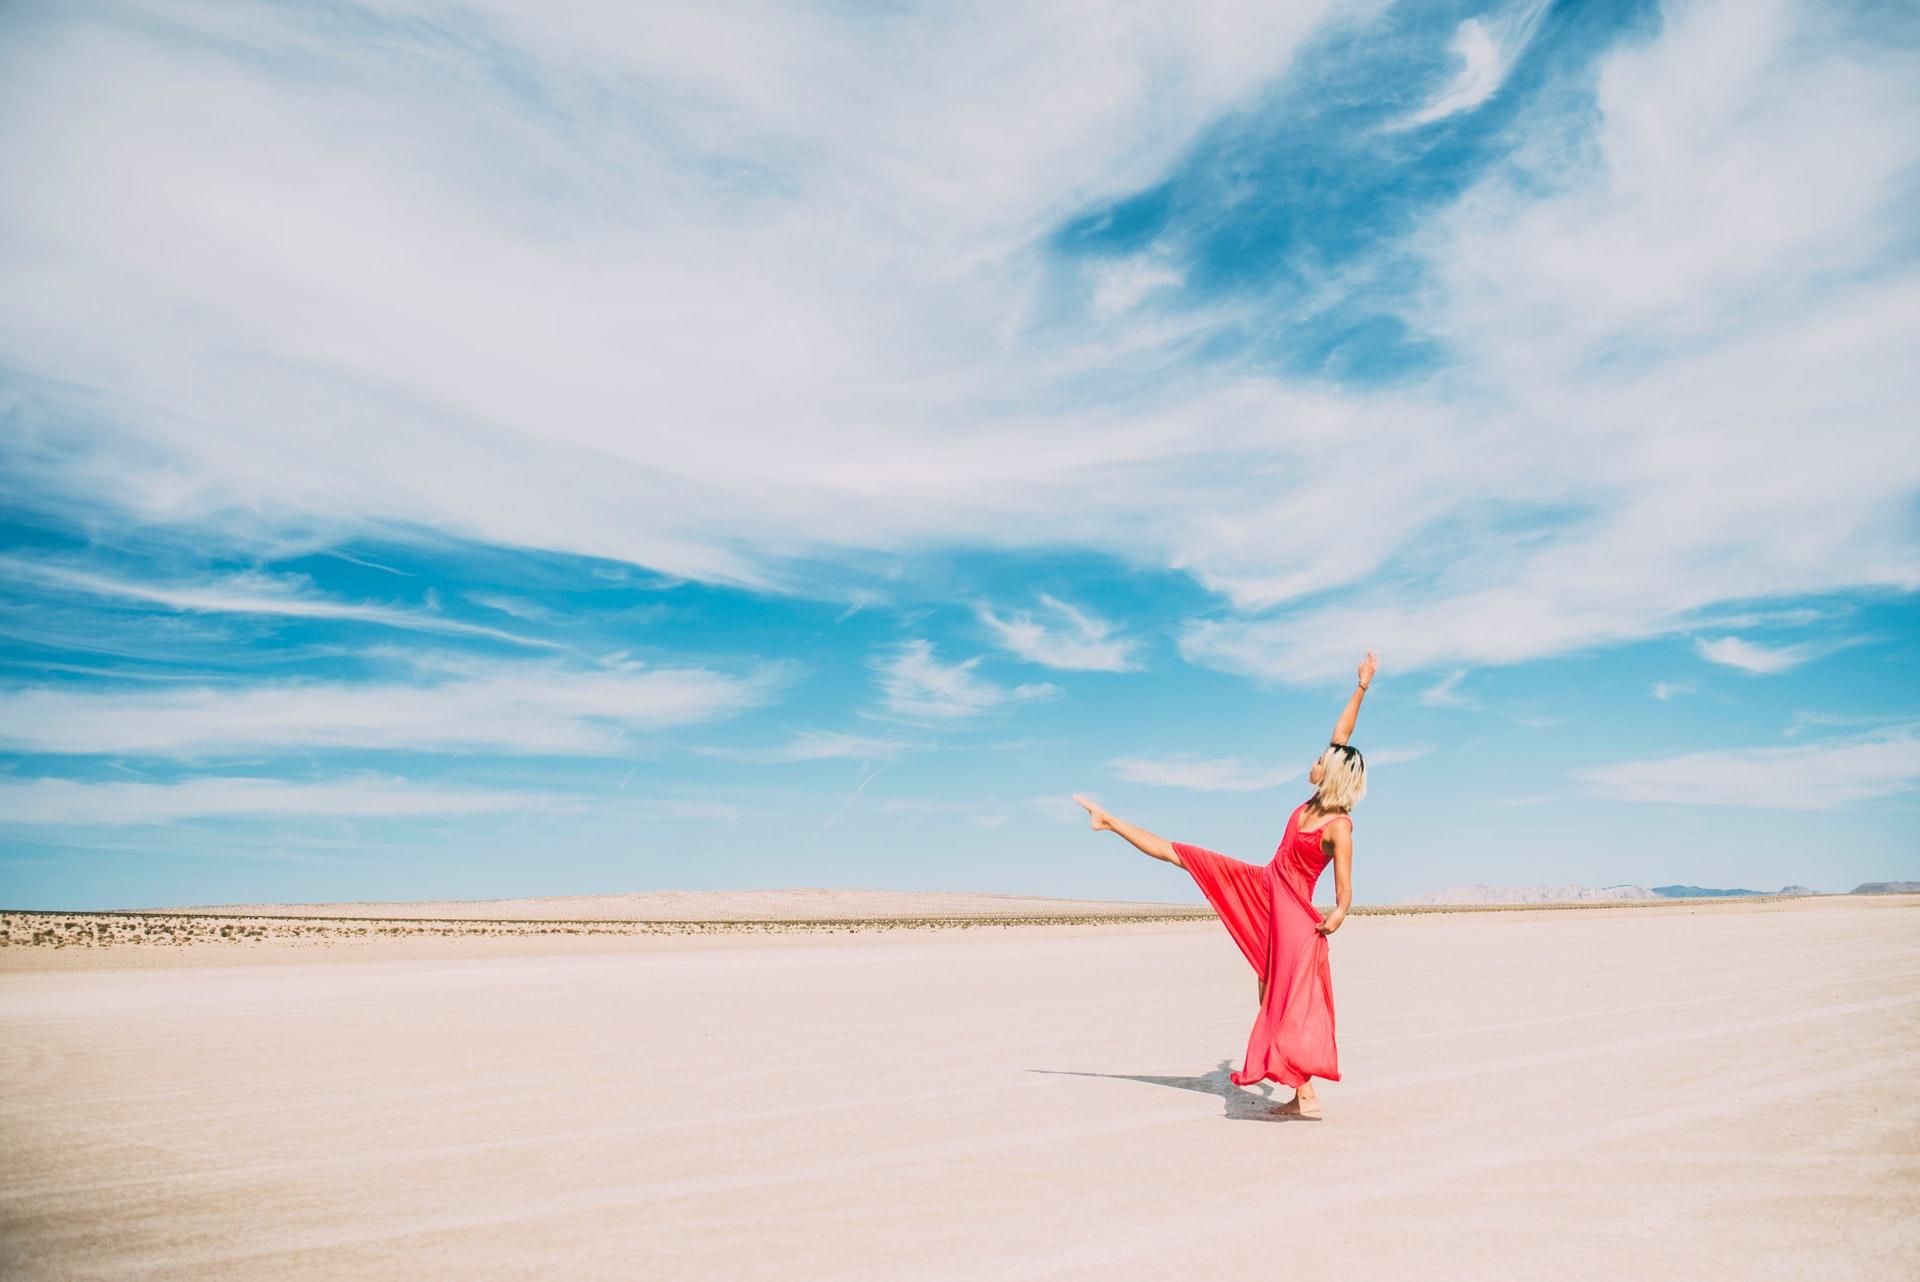 Yoga Retreat in the sahara desert - Sahara Desert Camping - Sahara Desert Activities